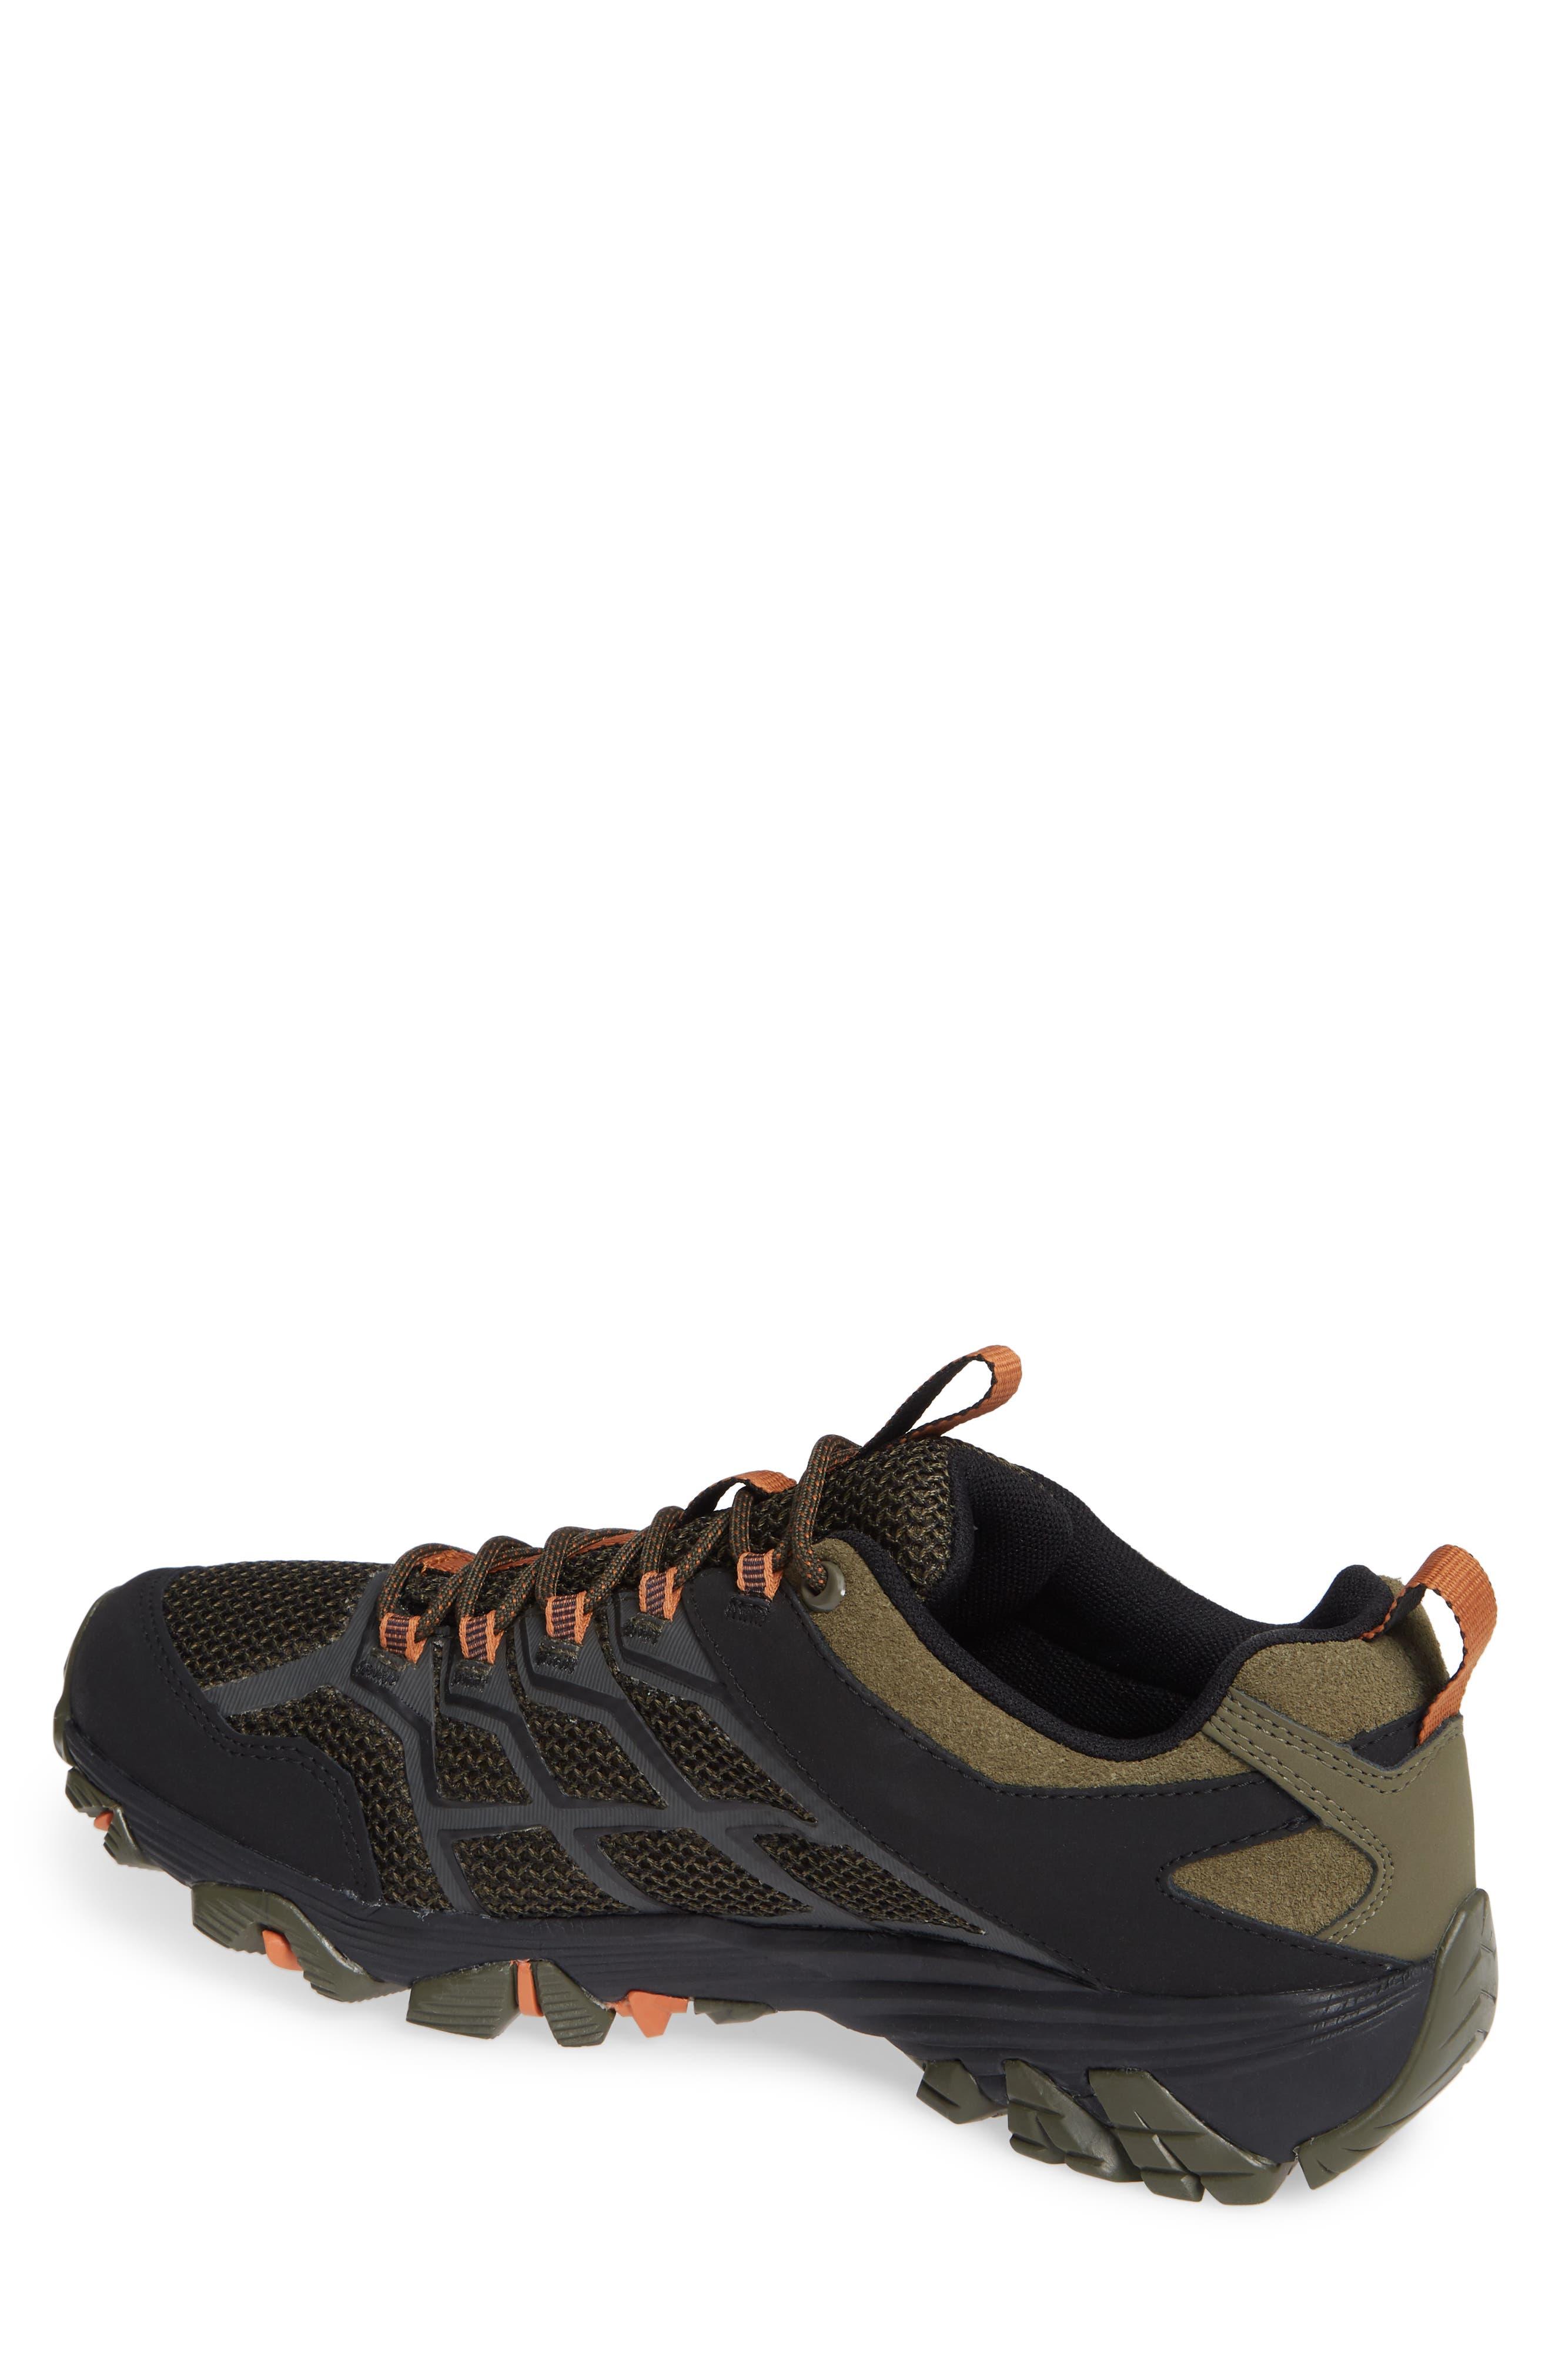 MERRELL, Moab FST 2 Waterproof Hiking Shoe, Alternate thumbnail 2, color, OLIVE/ ADOBE